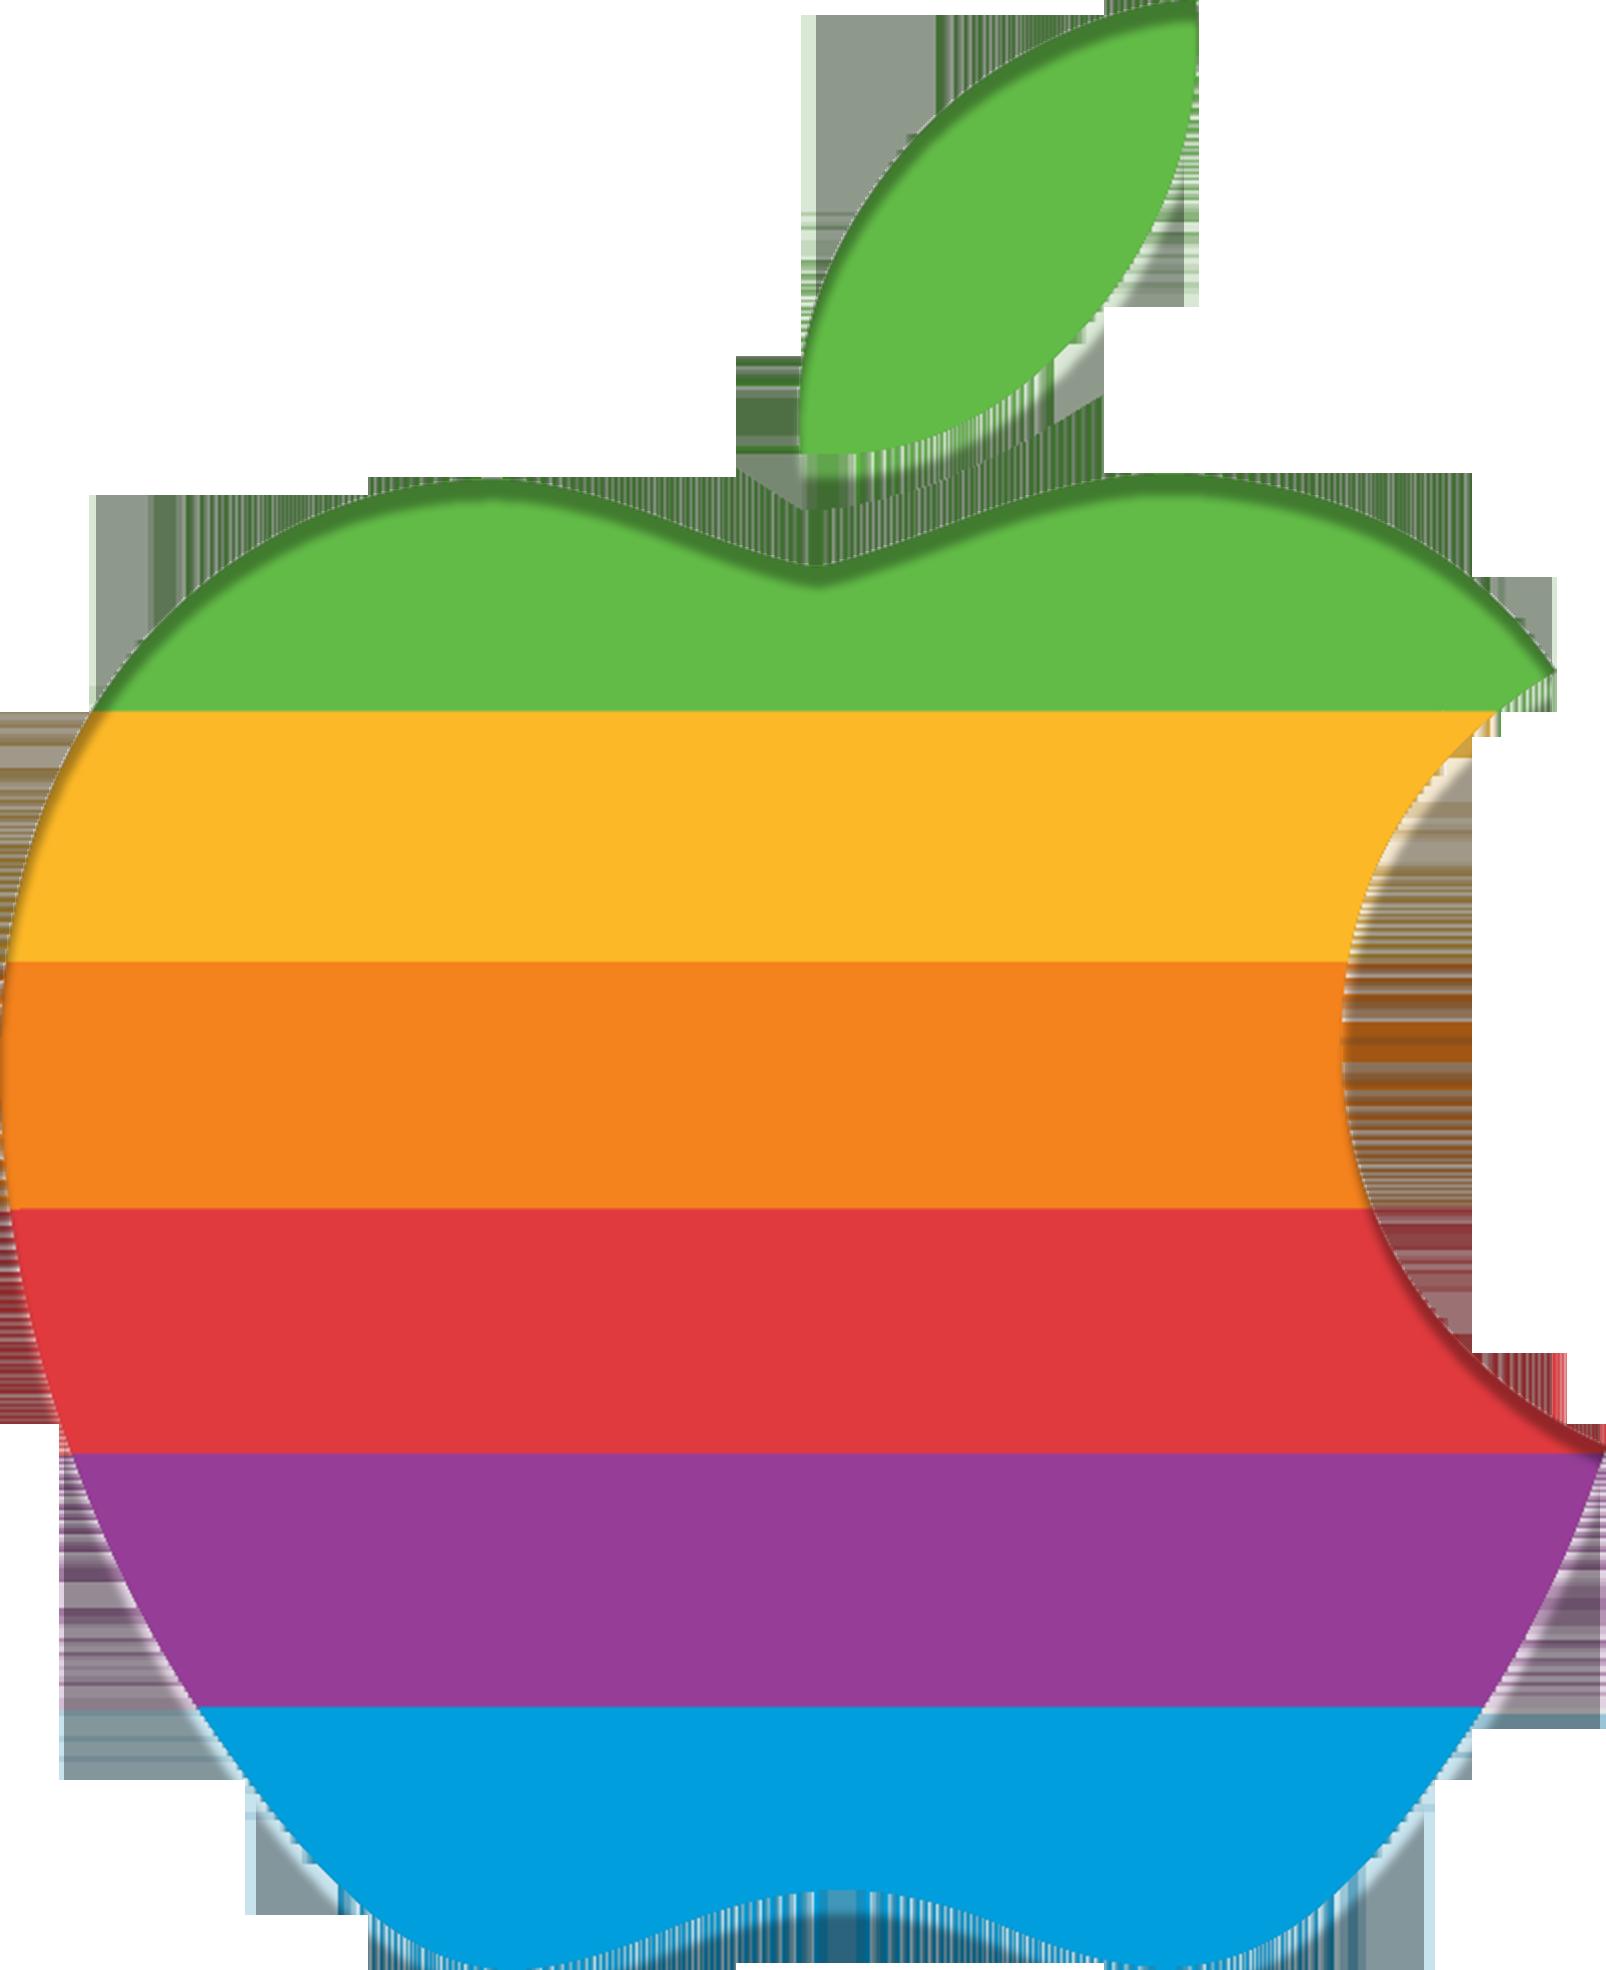 Free Apple Logo Png Transparent Background, Download Free.